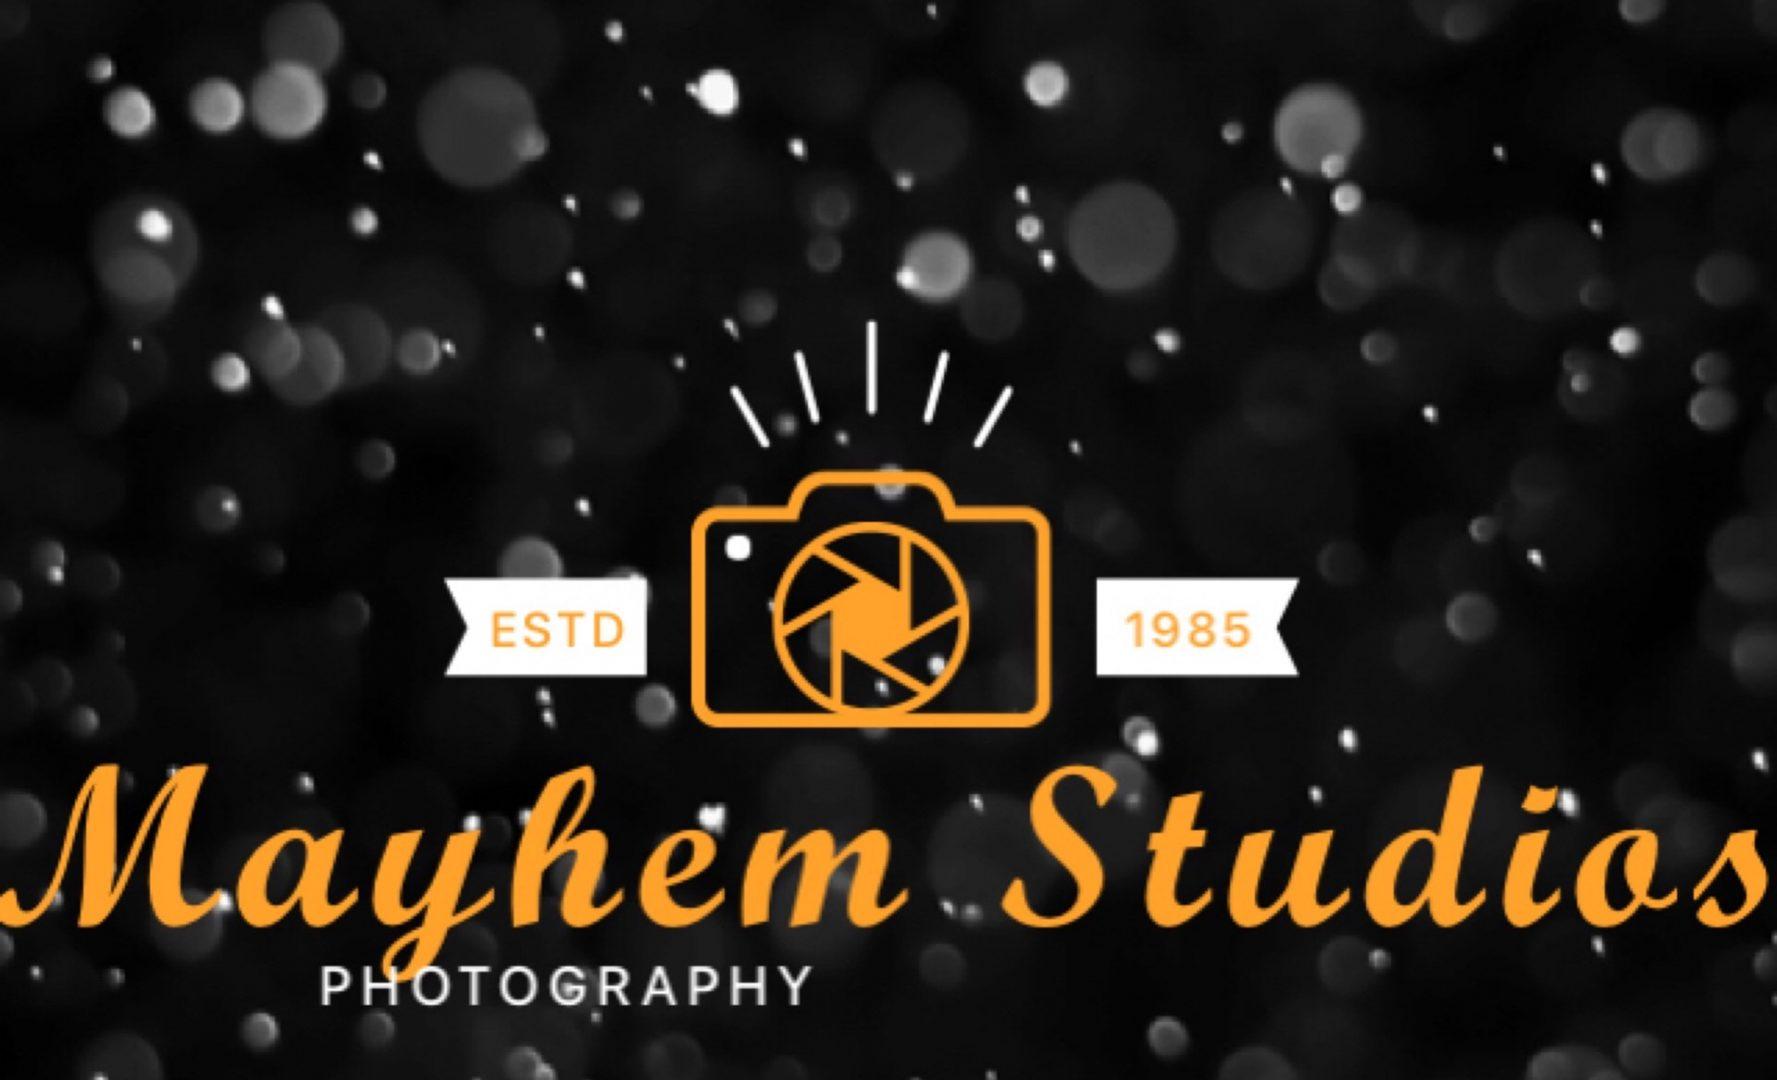 Mayhem Studios